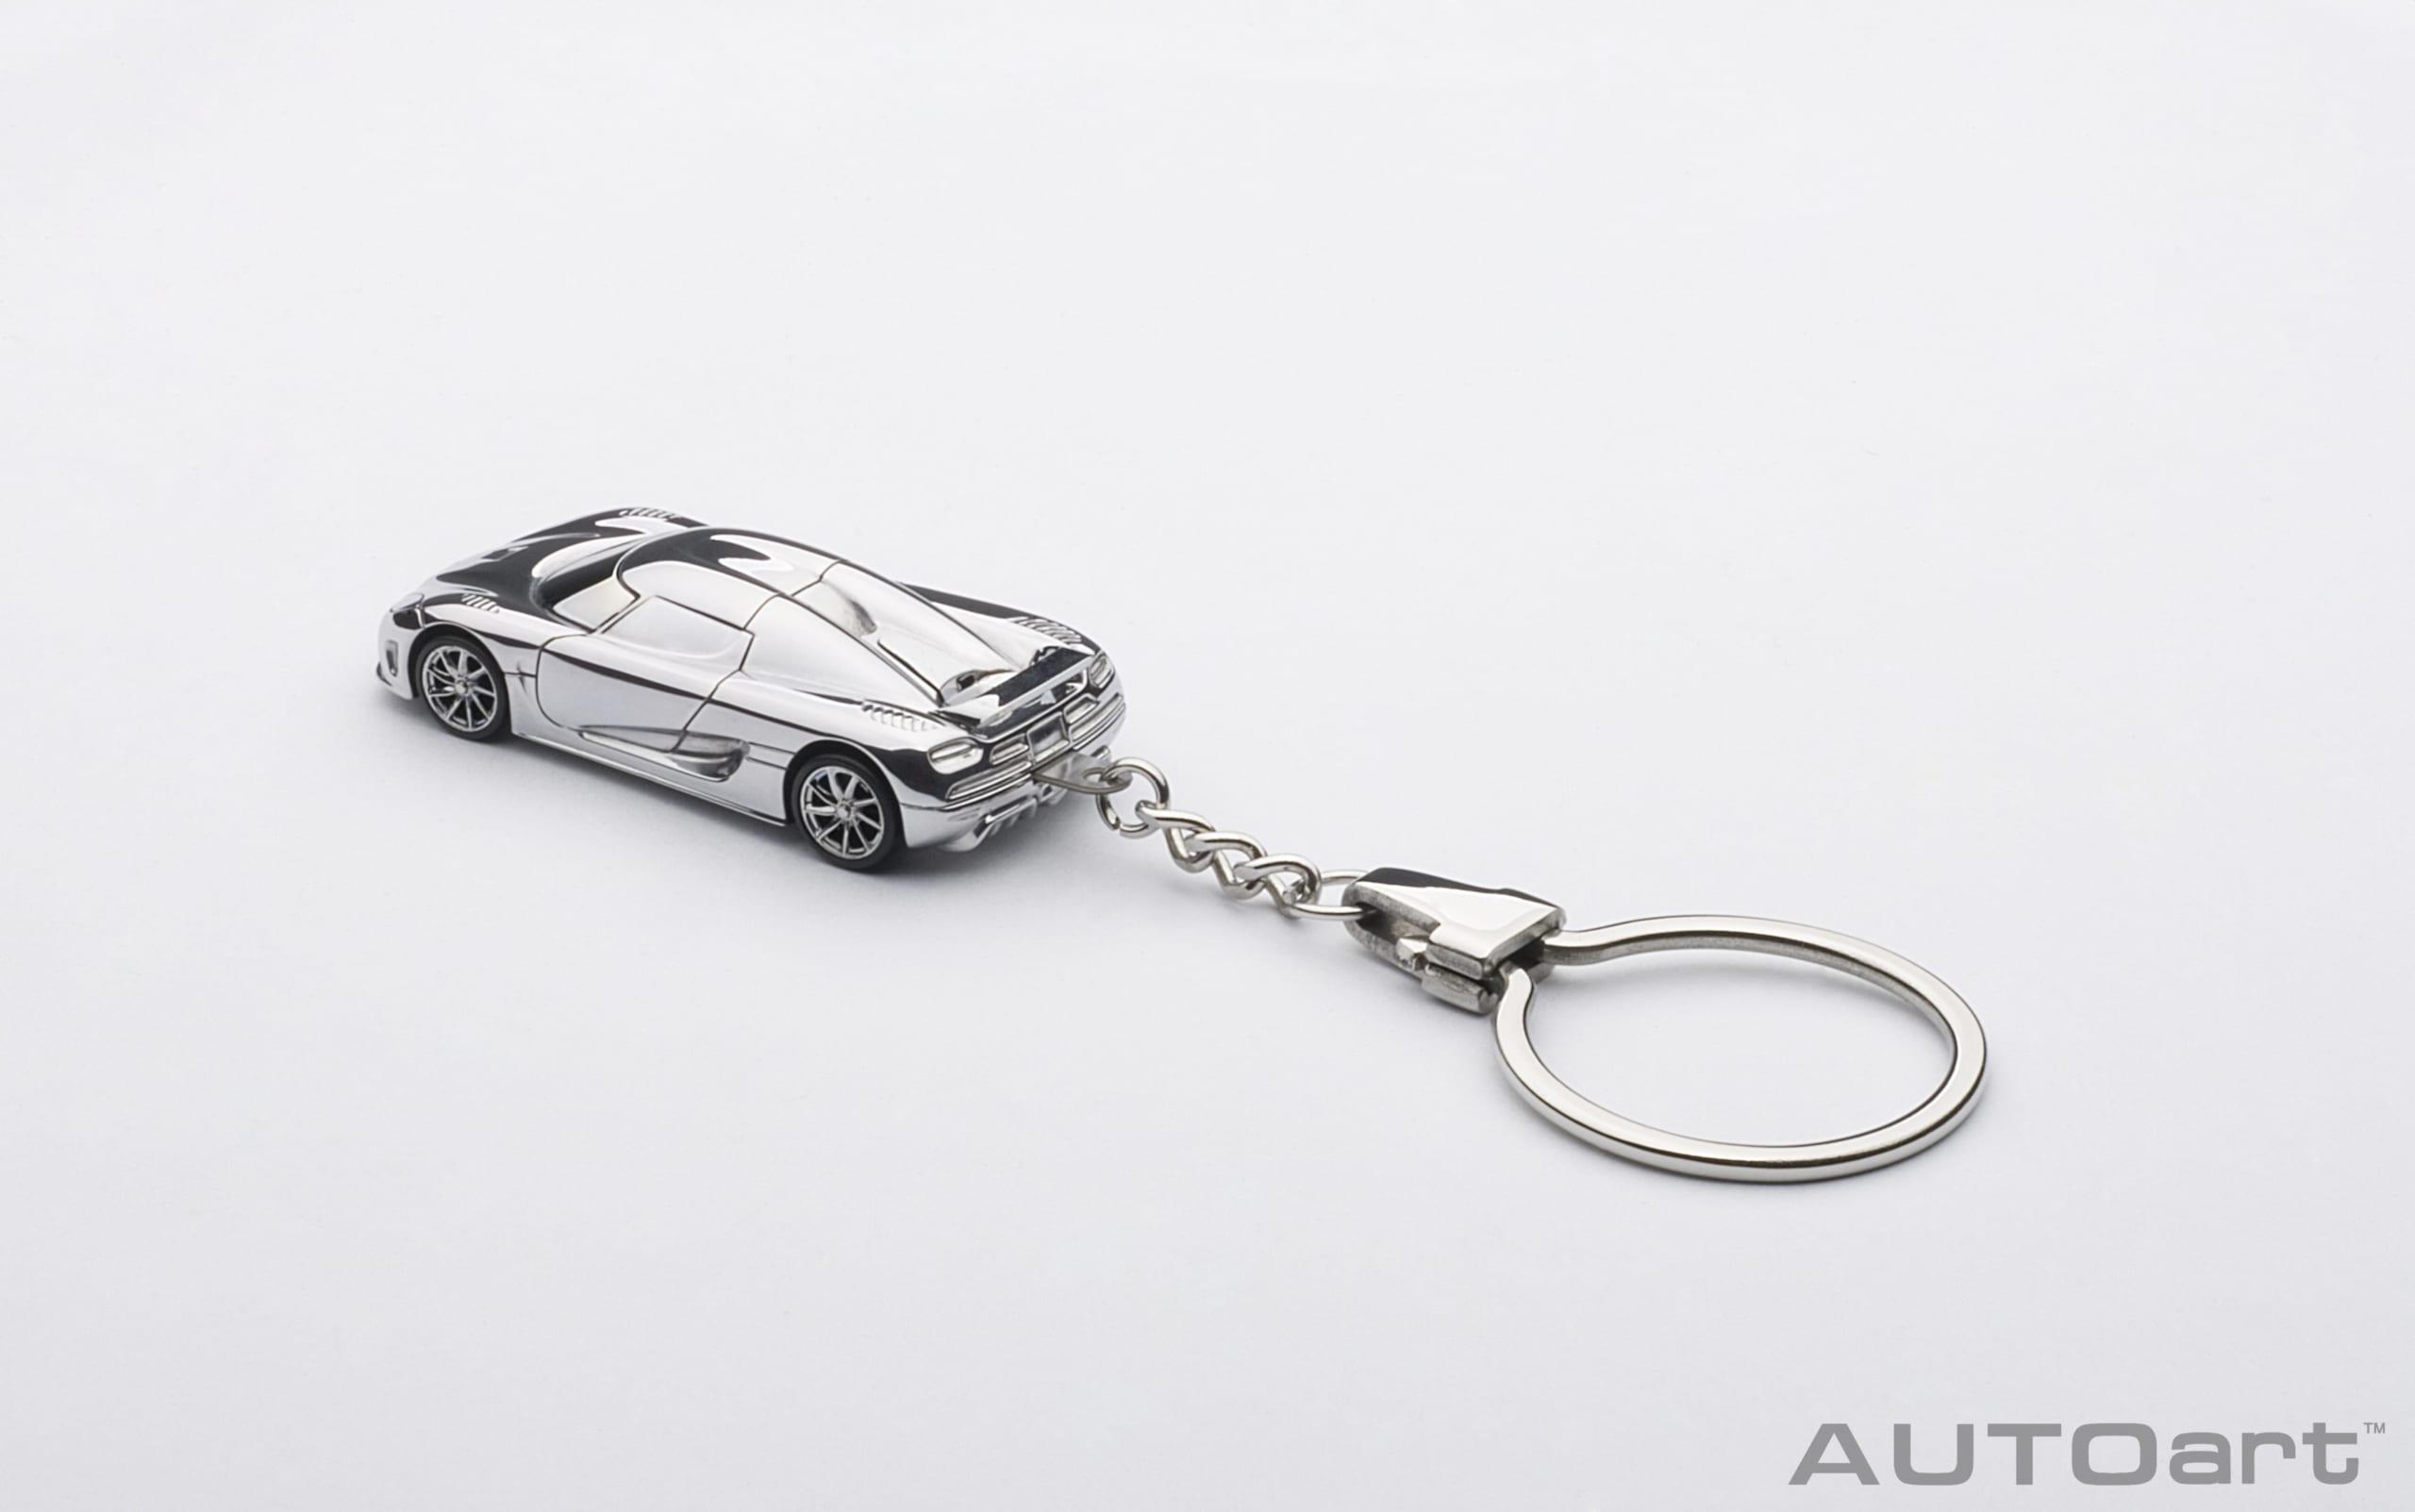 Koenigsegg Agera aluminium casting 1:87 AUTOart keyring